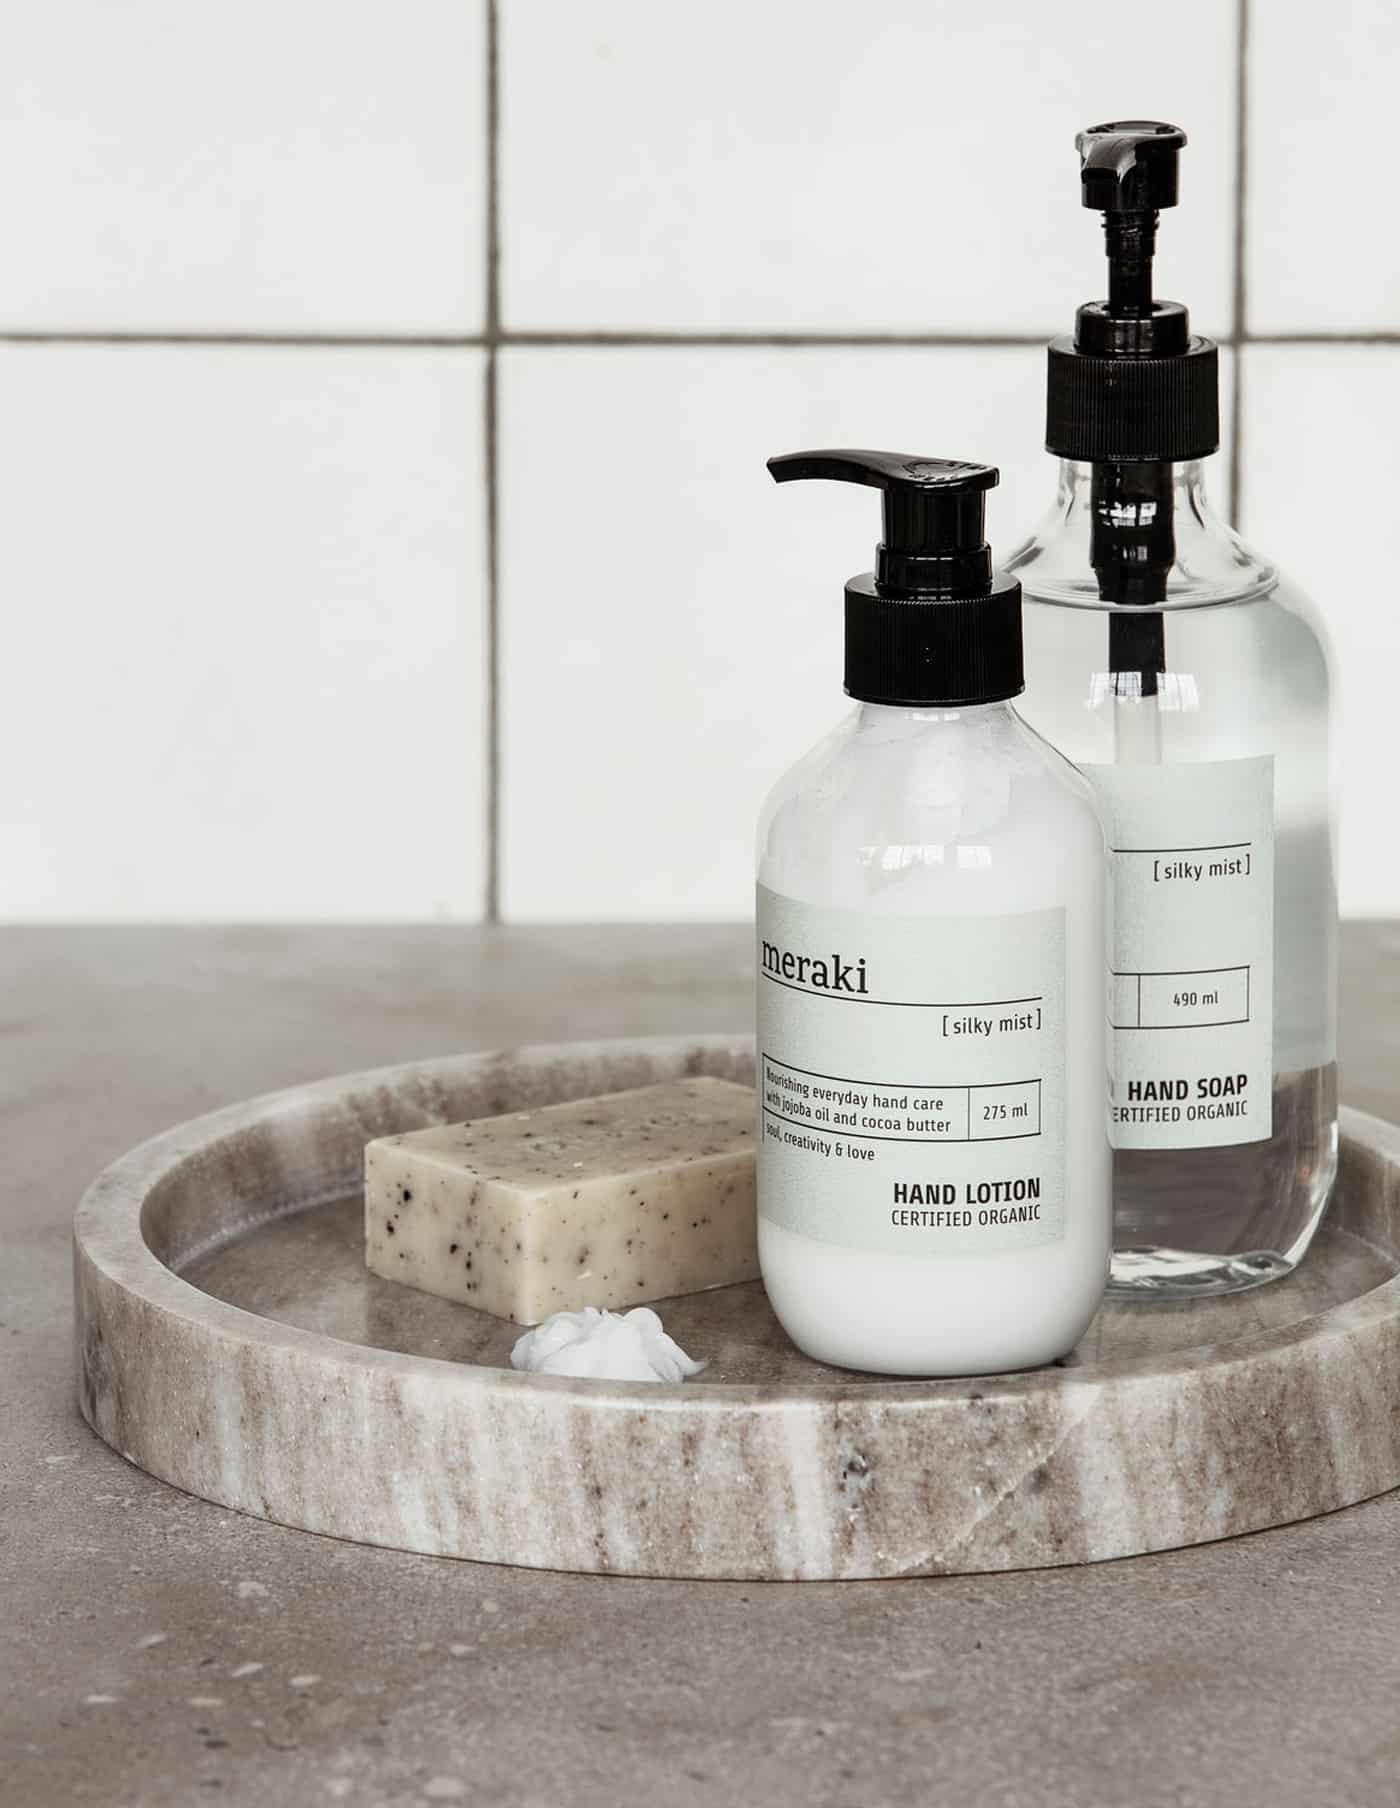 Silky Mist Meraki Hand Soap, Certified Organic